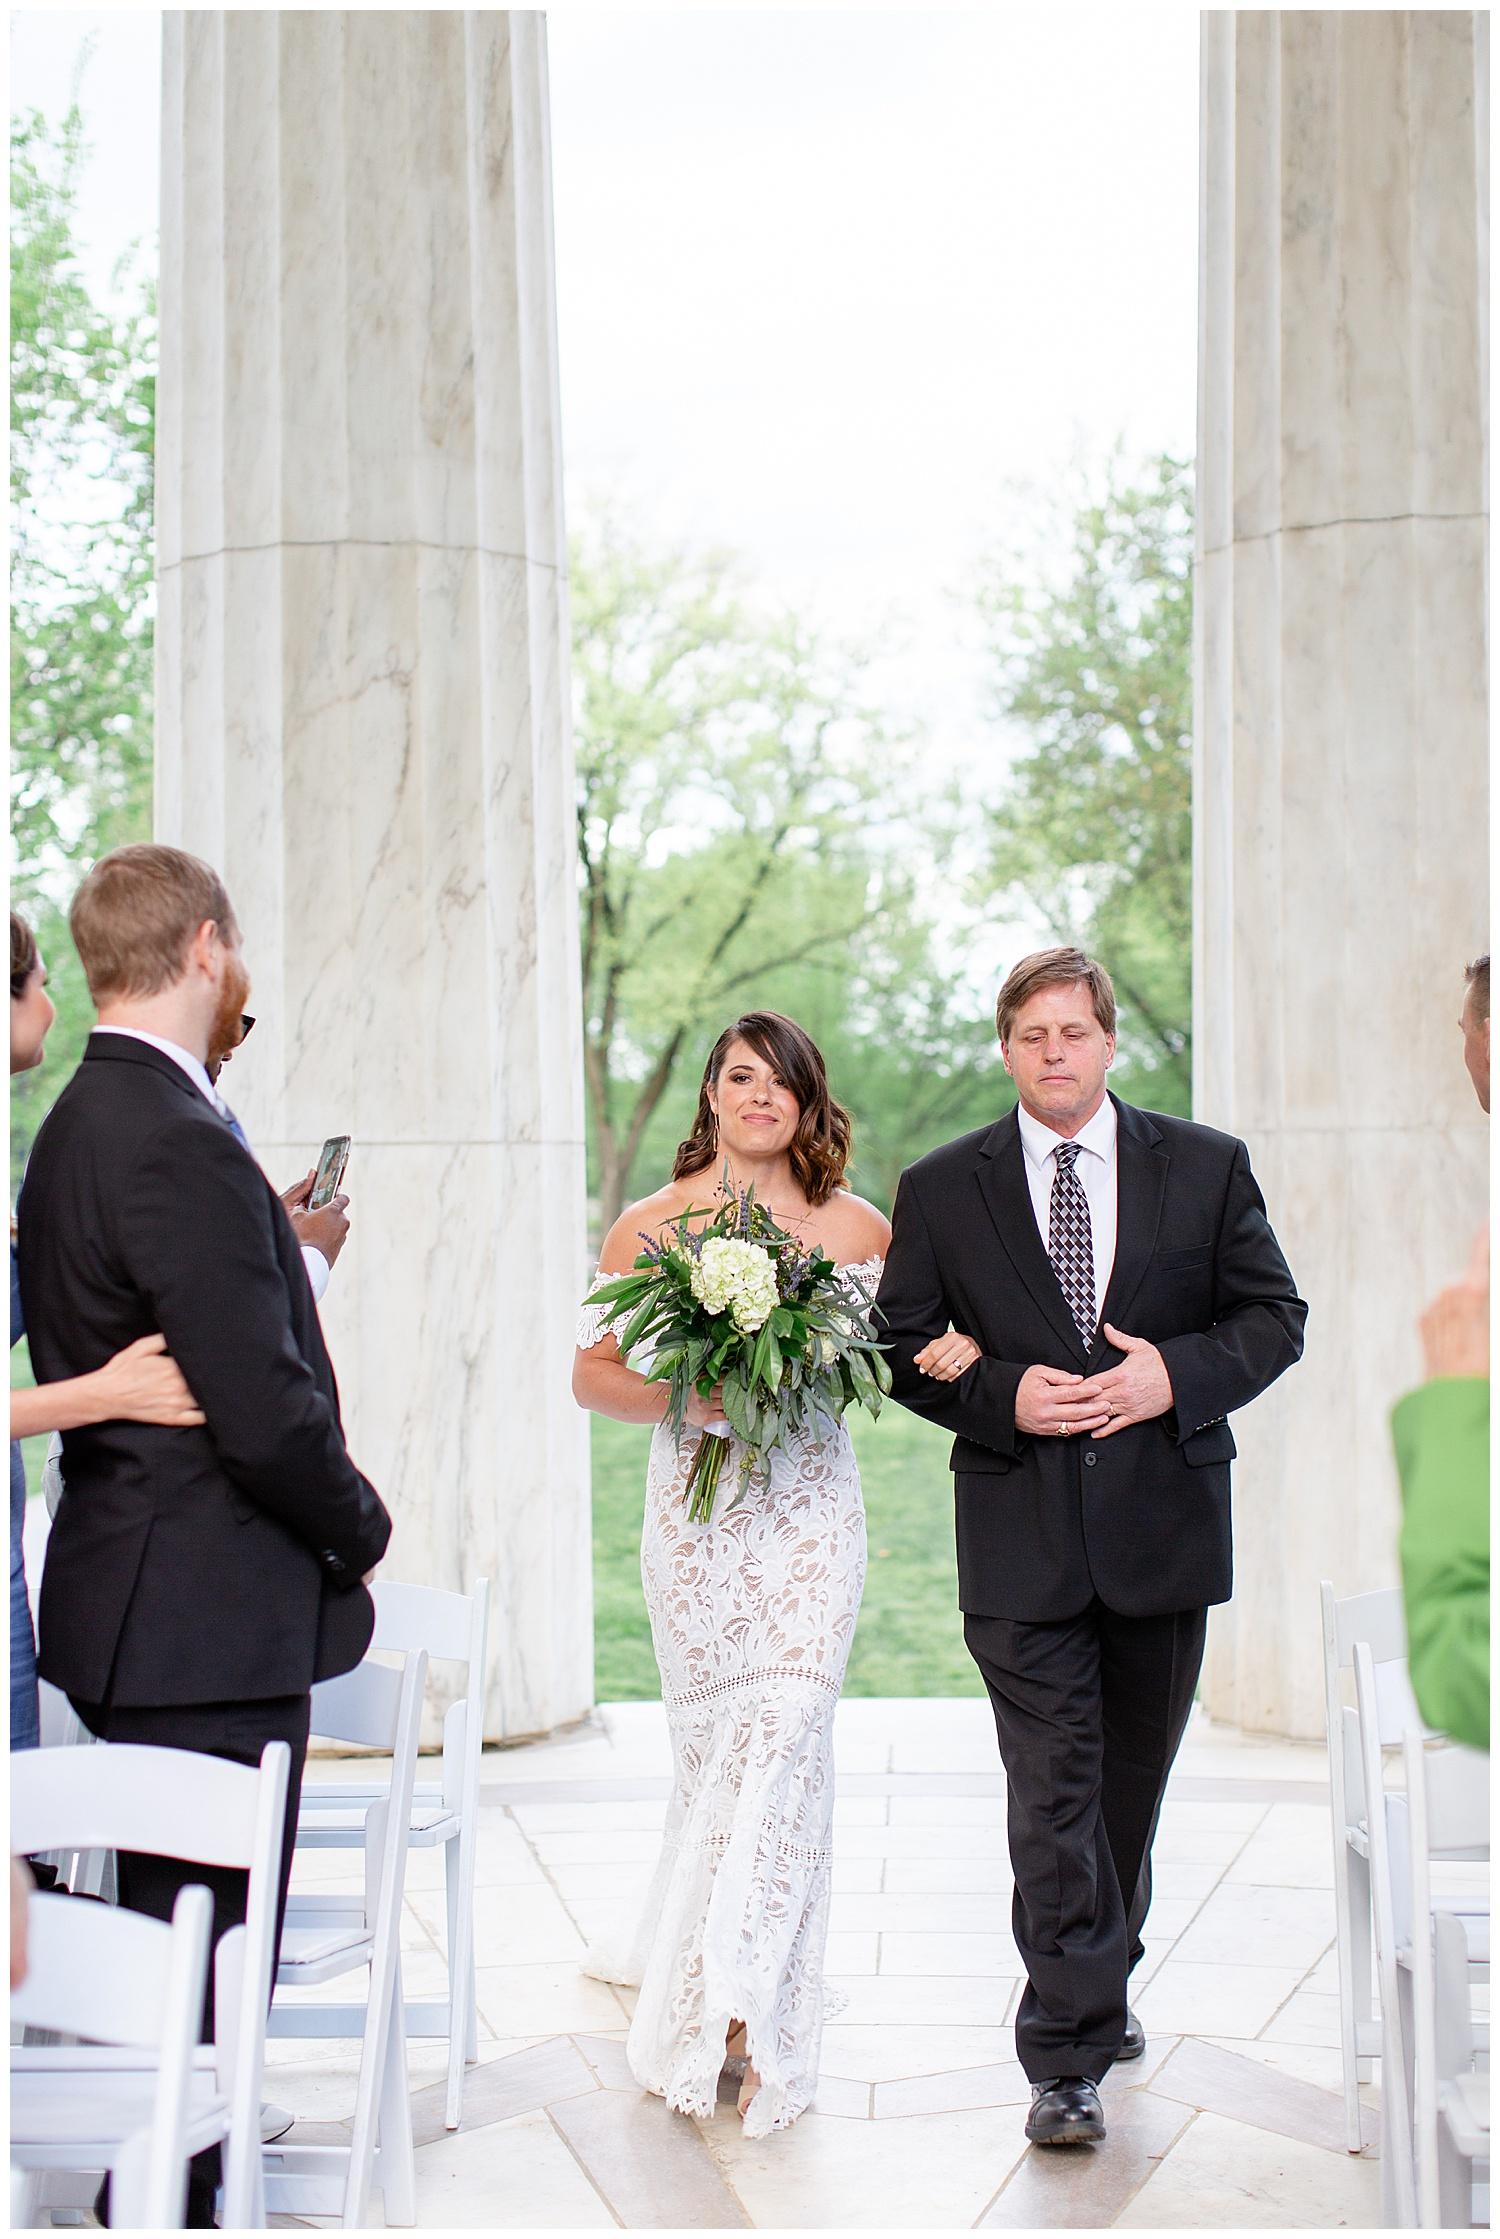 emily-belson-photography-washington-dc-wedding-08.jpg